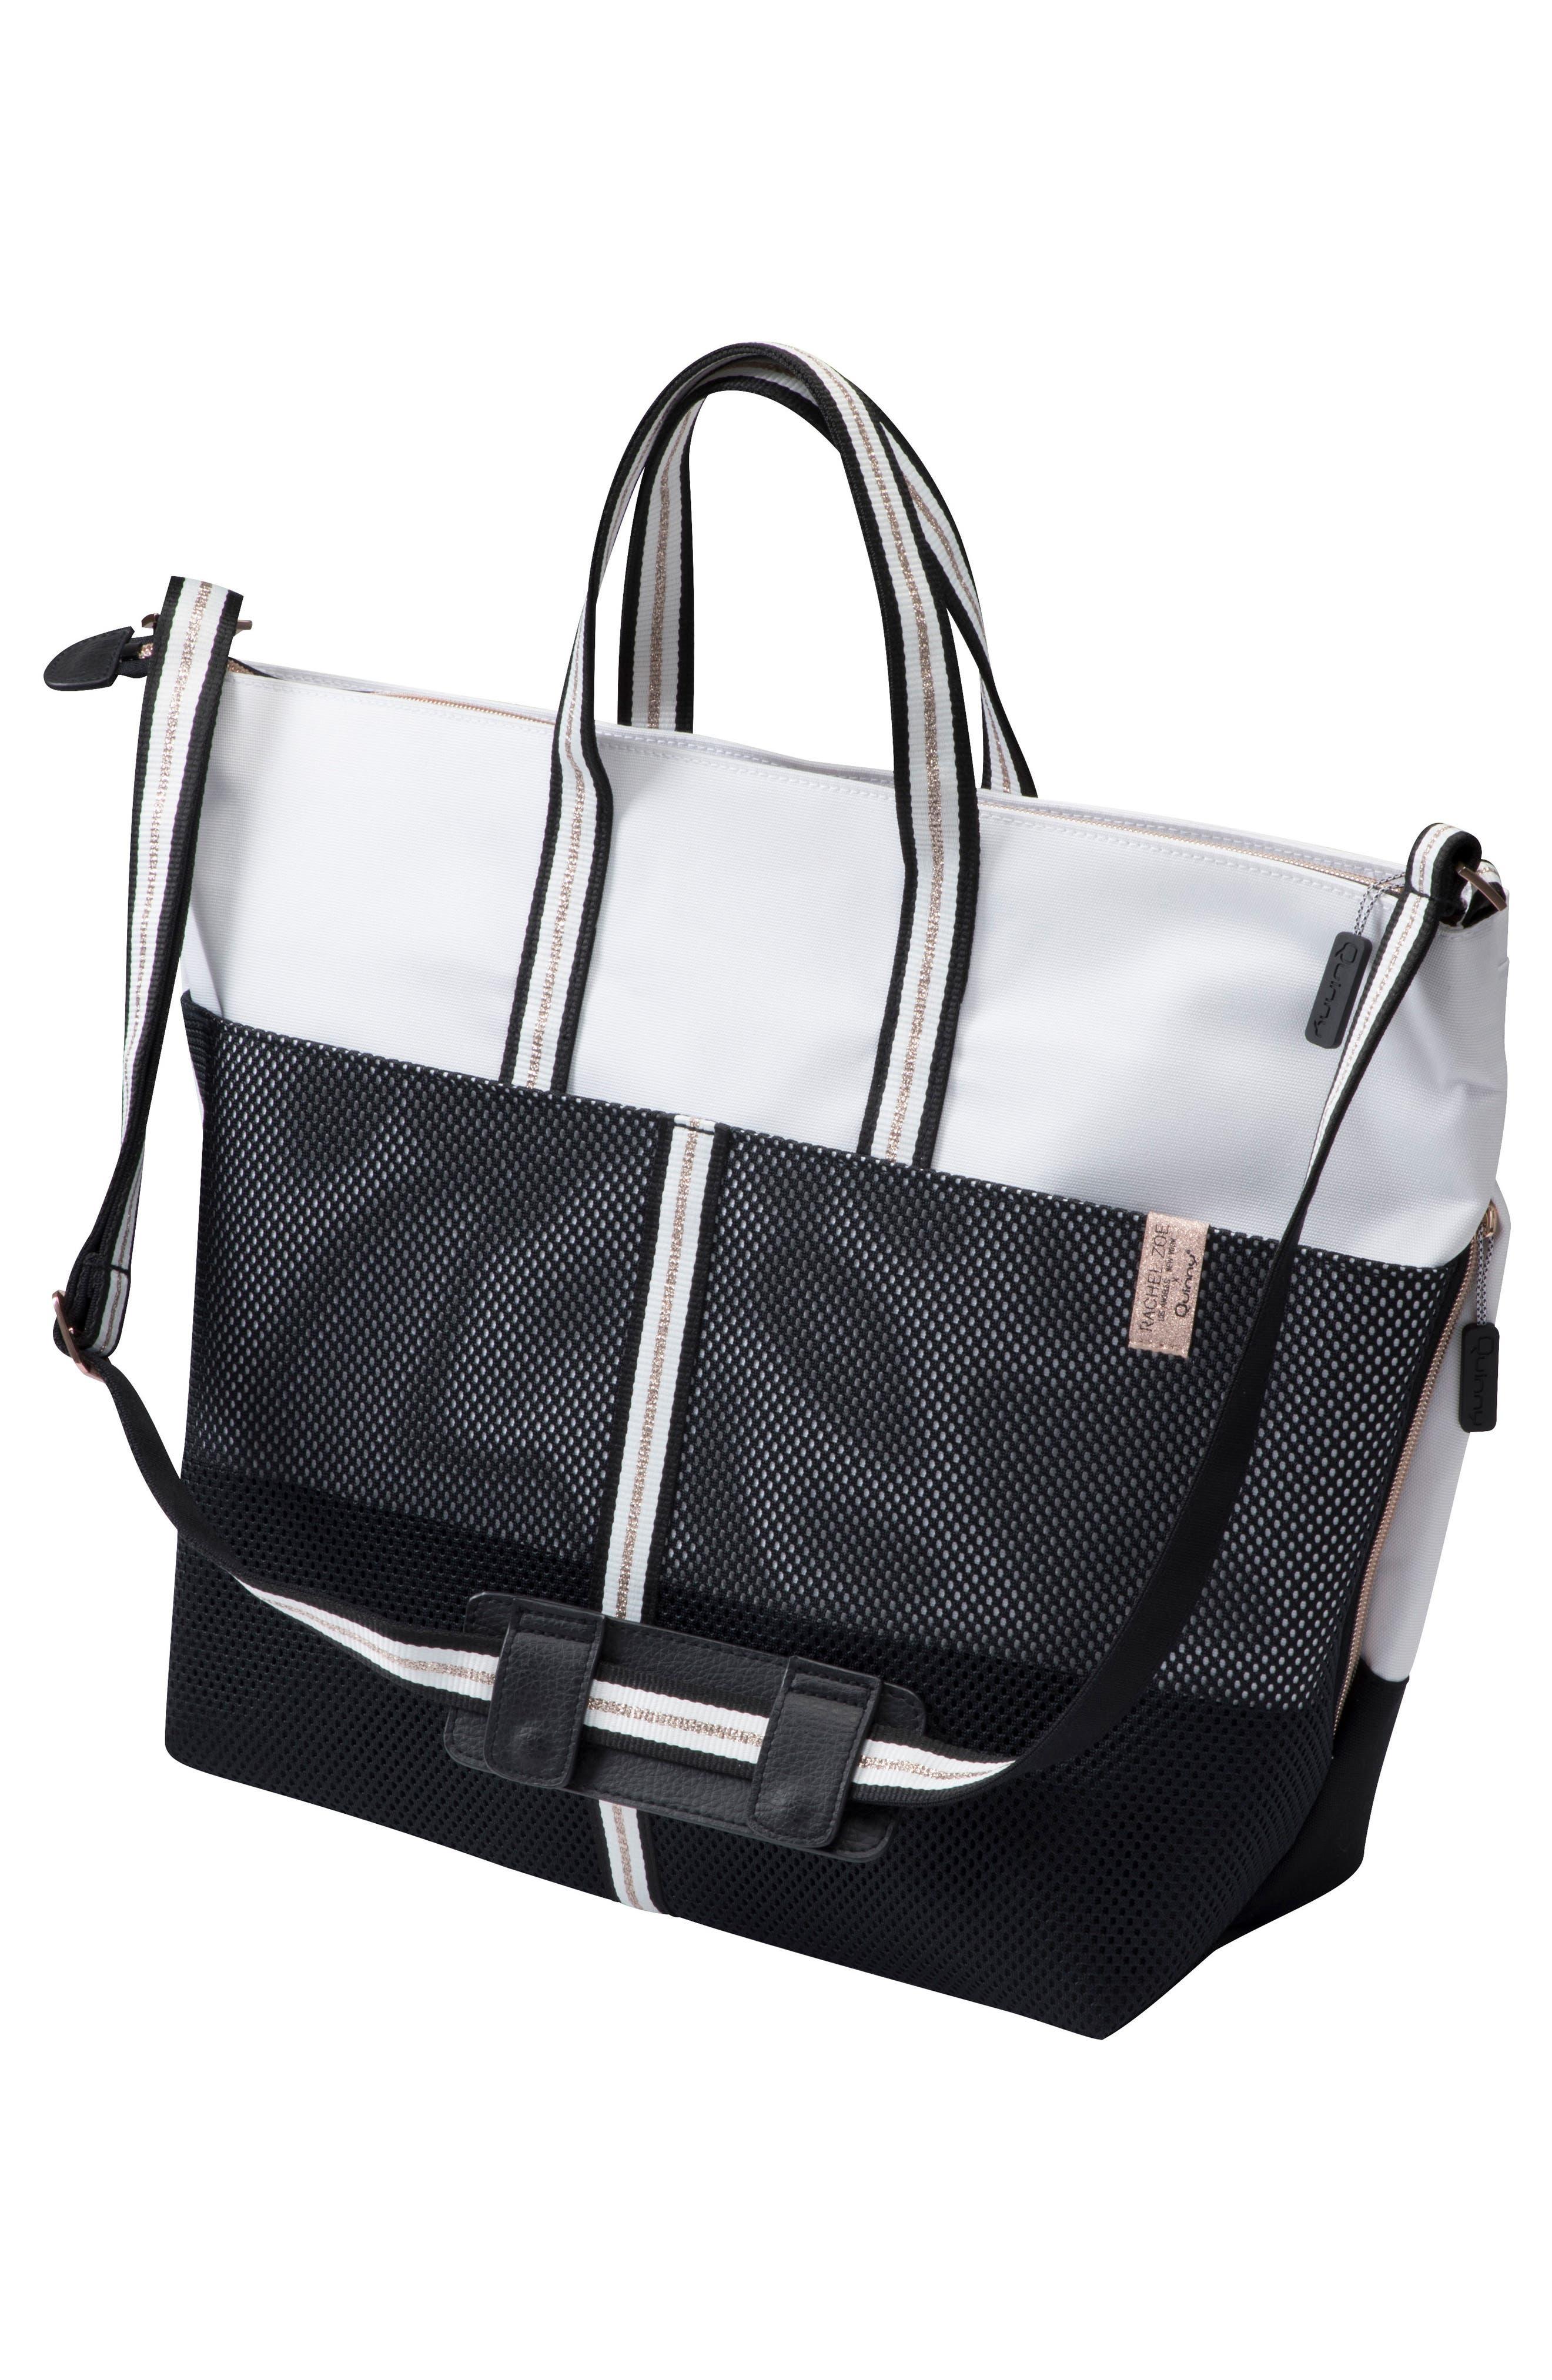 x Rachel Zoe Luxe Sport Diaper Bag,                             Alternate thumbnail 2, color,                             Rz Luxe Sport